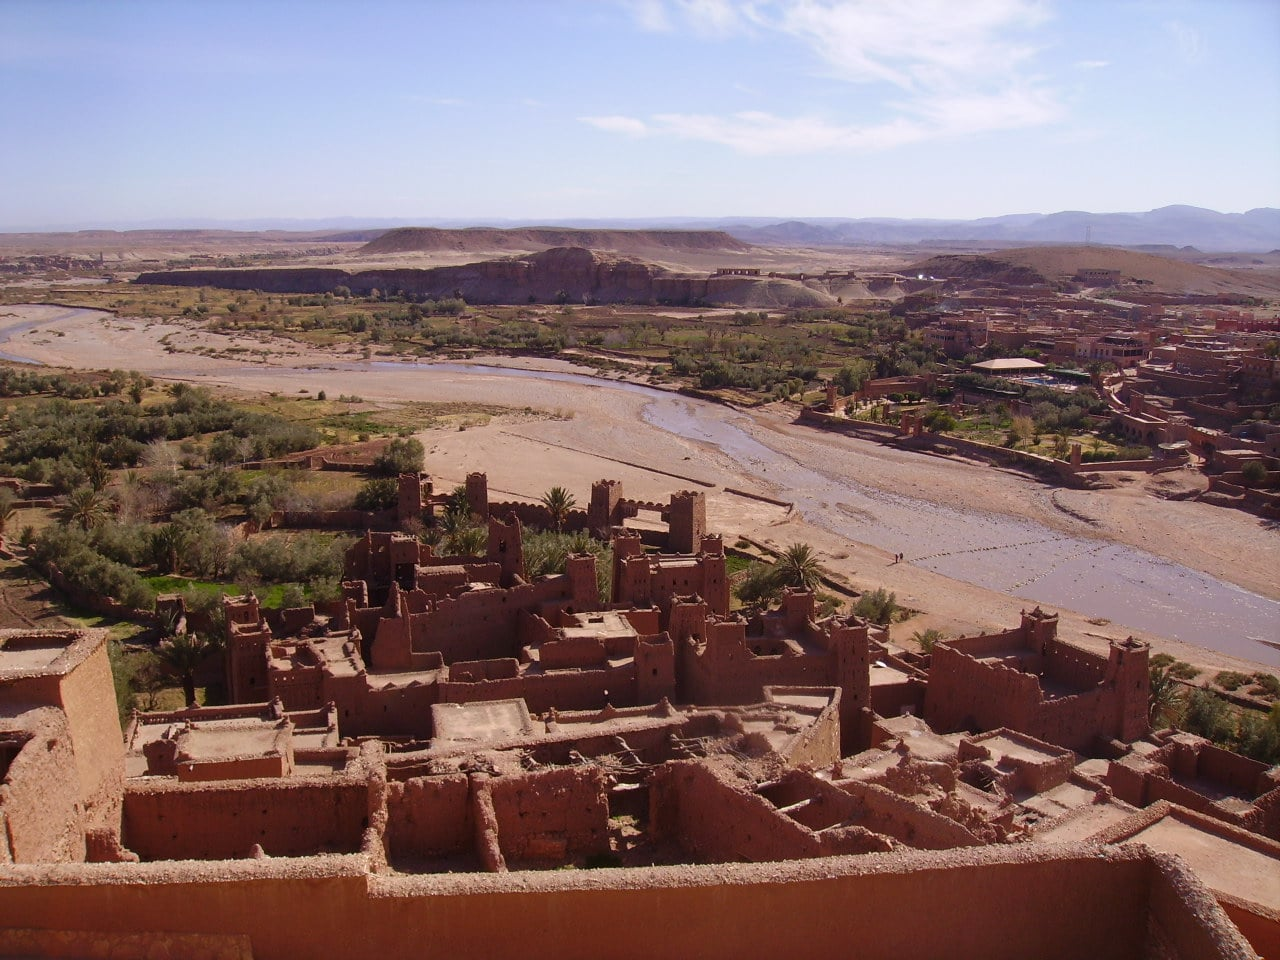 The fascinating ksar of Ait Benhaddou - Wandering Life